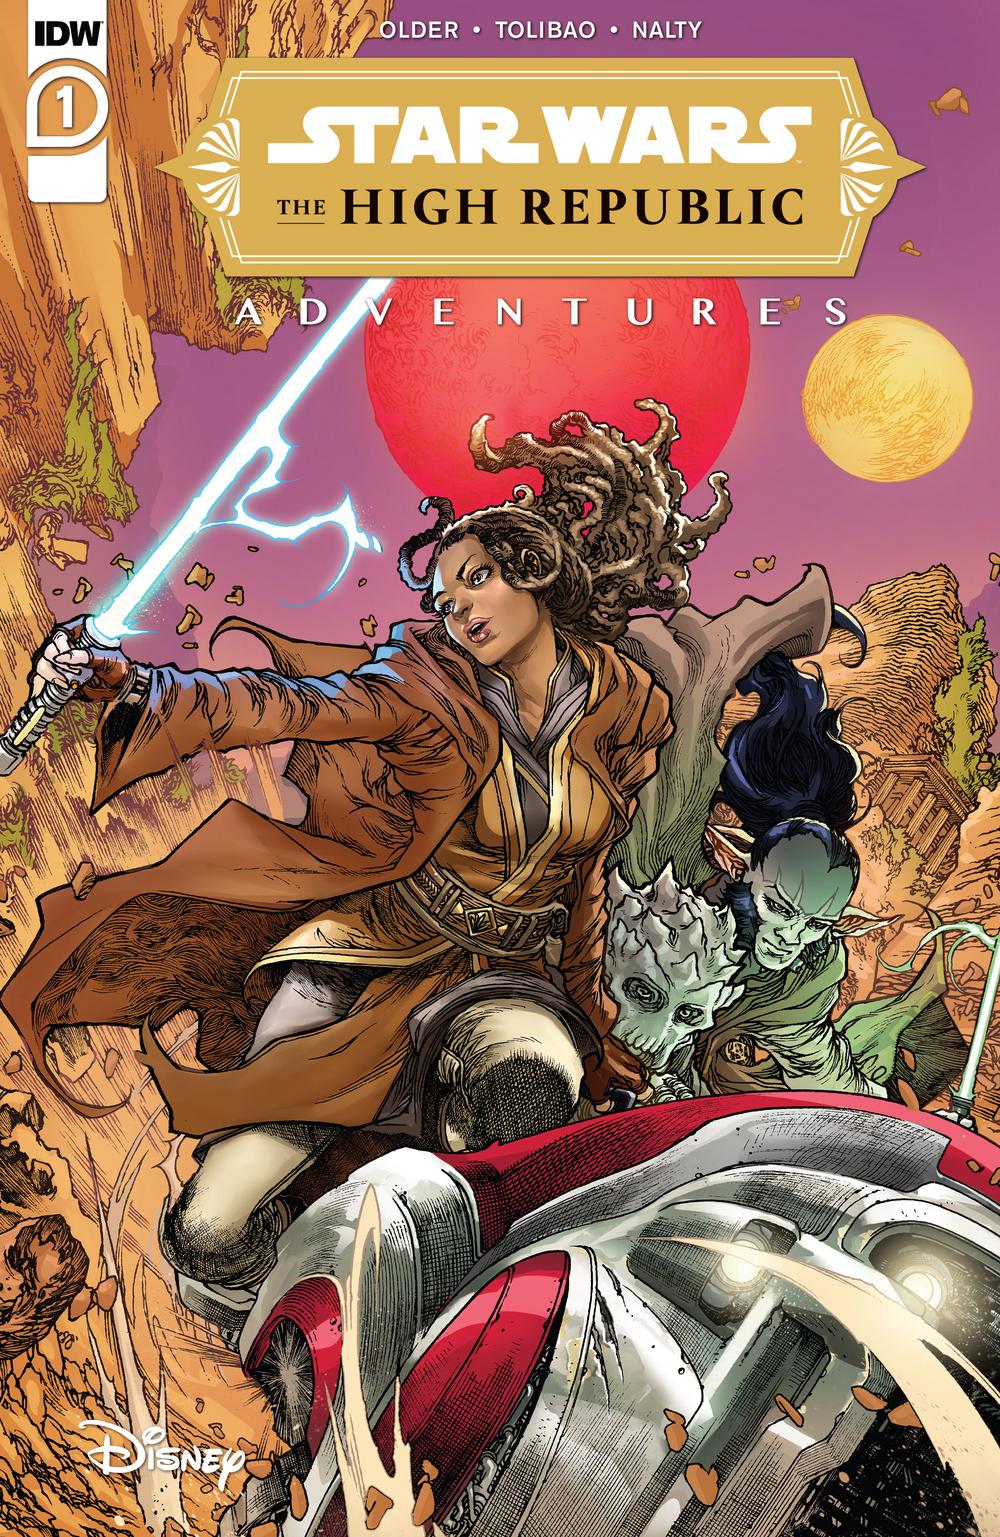 L'Alta Repubblica Avventure #1 copertina